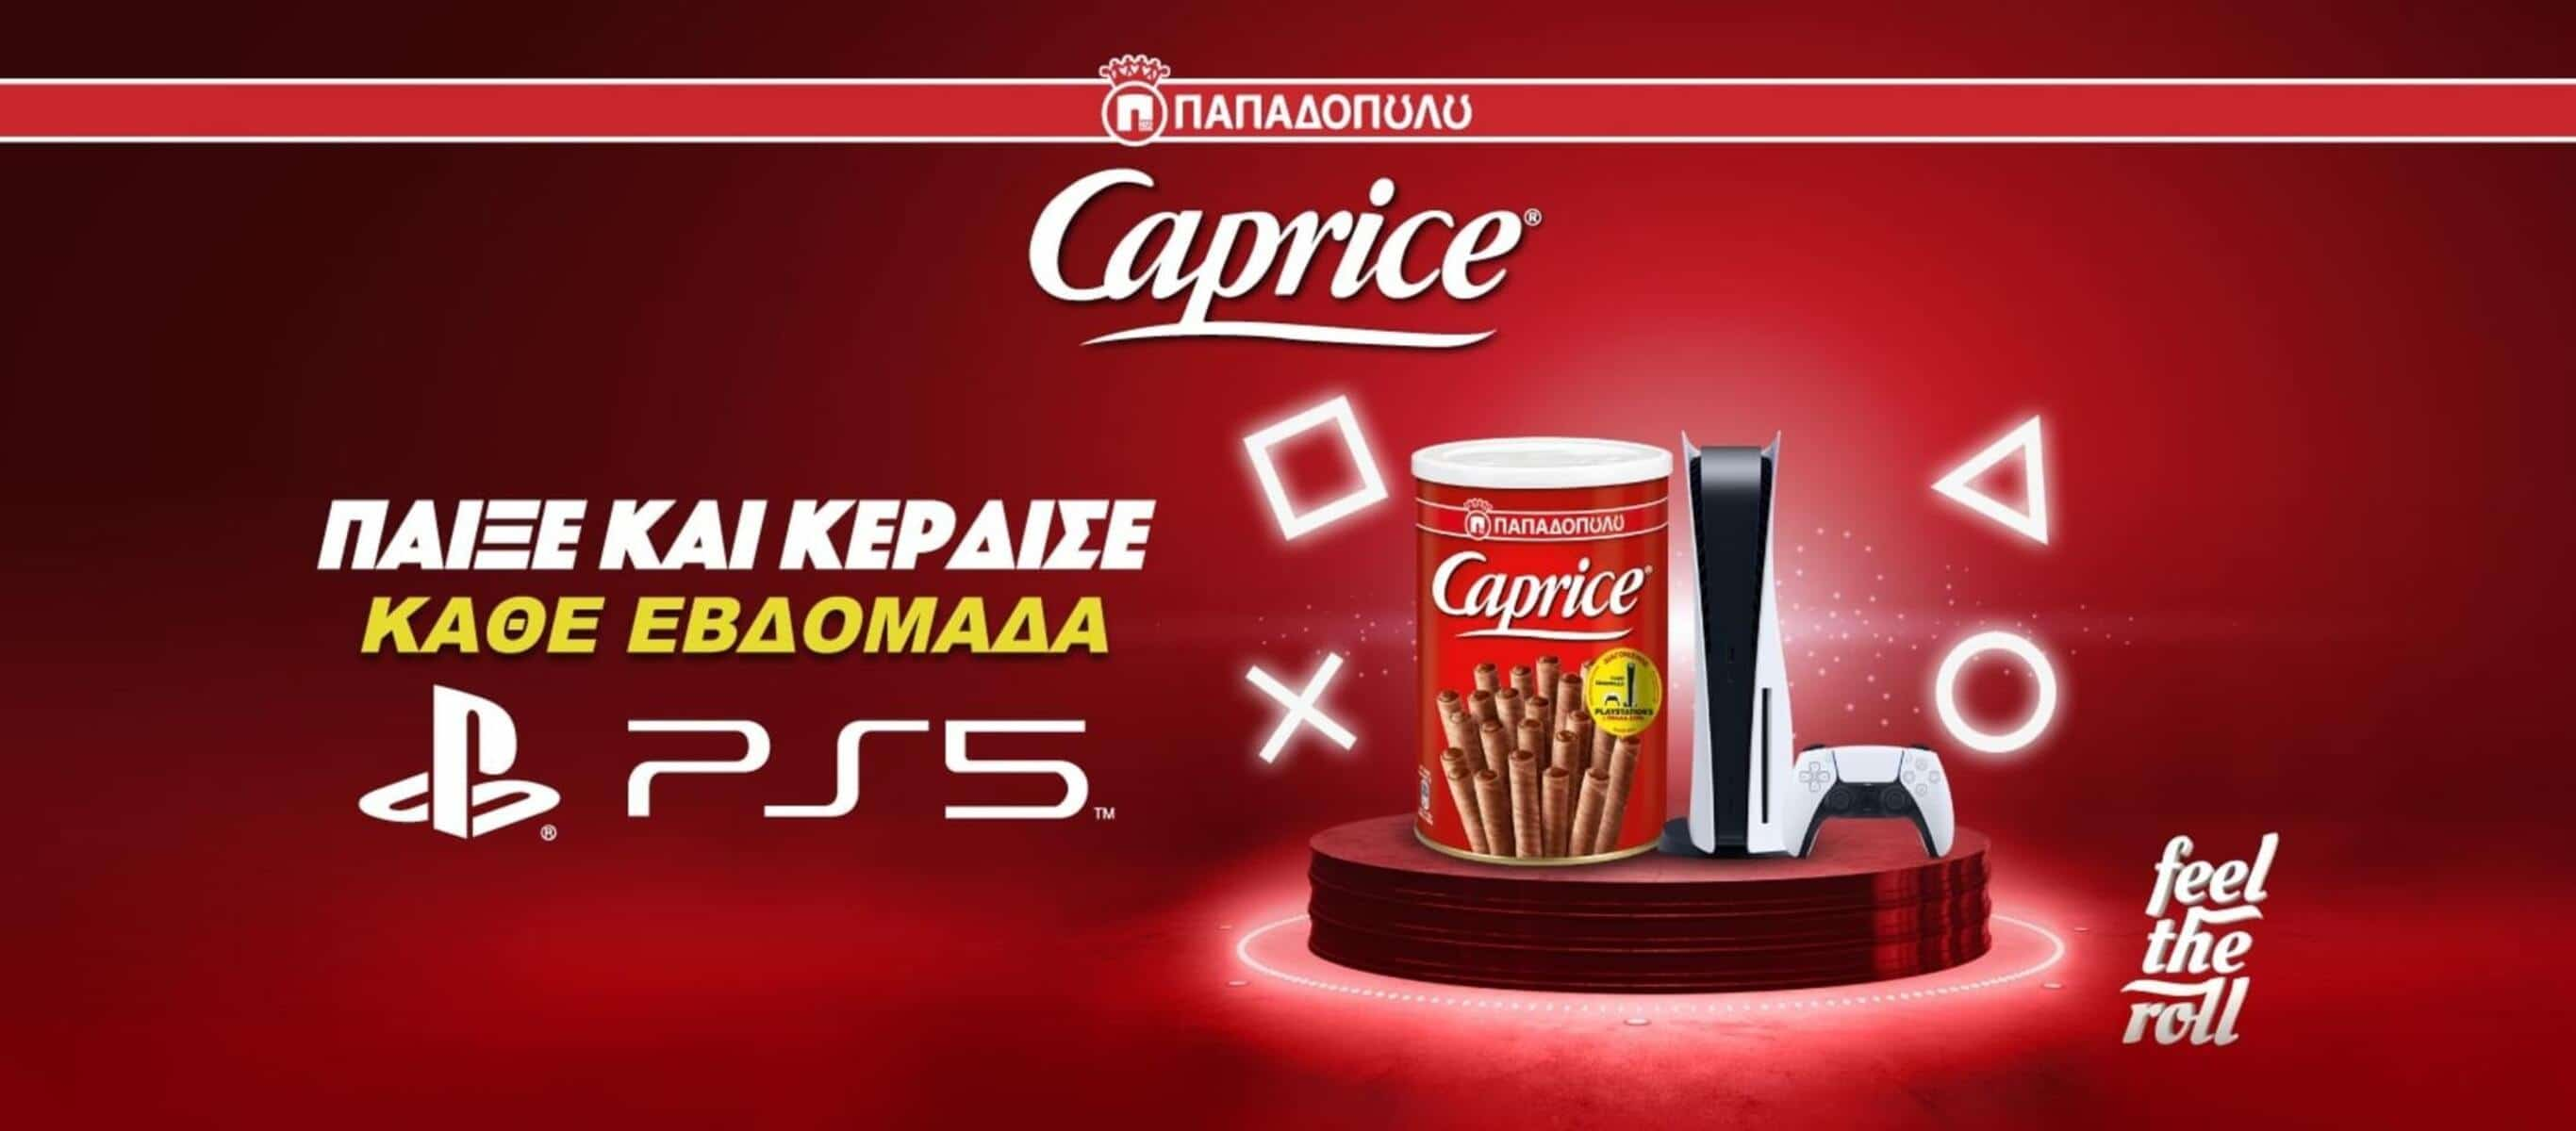 Featured image for Τα Caprice απογειώνουν την gaming εμπειρία κληρώνοντας PlayStation 5 κάθε εβδομάδα!